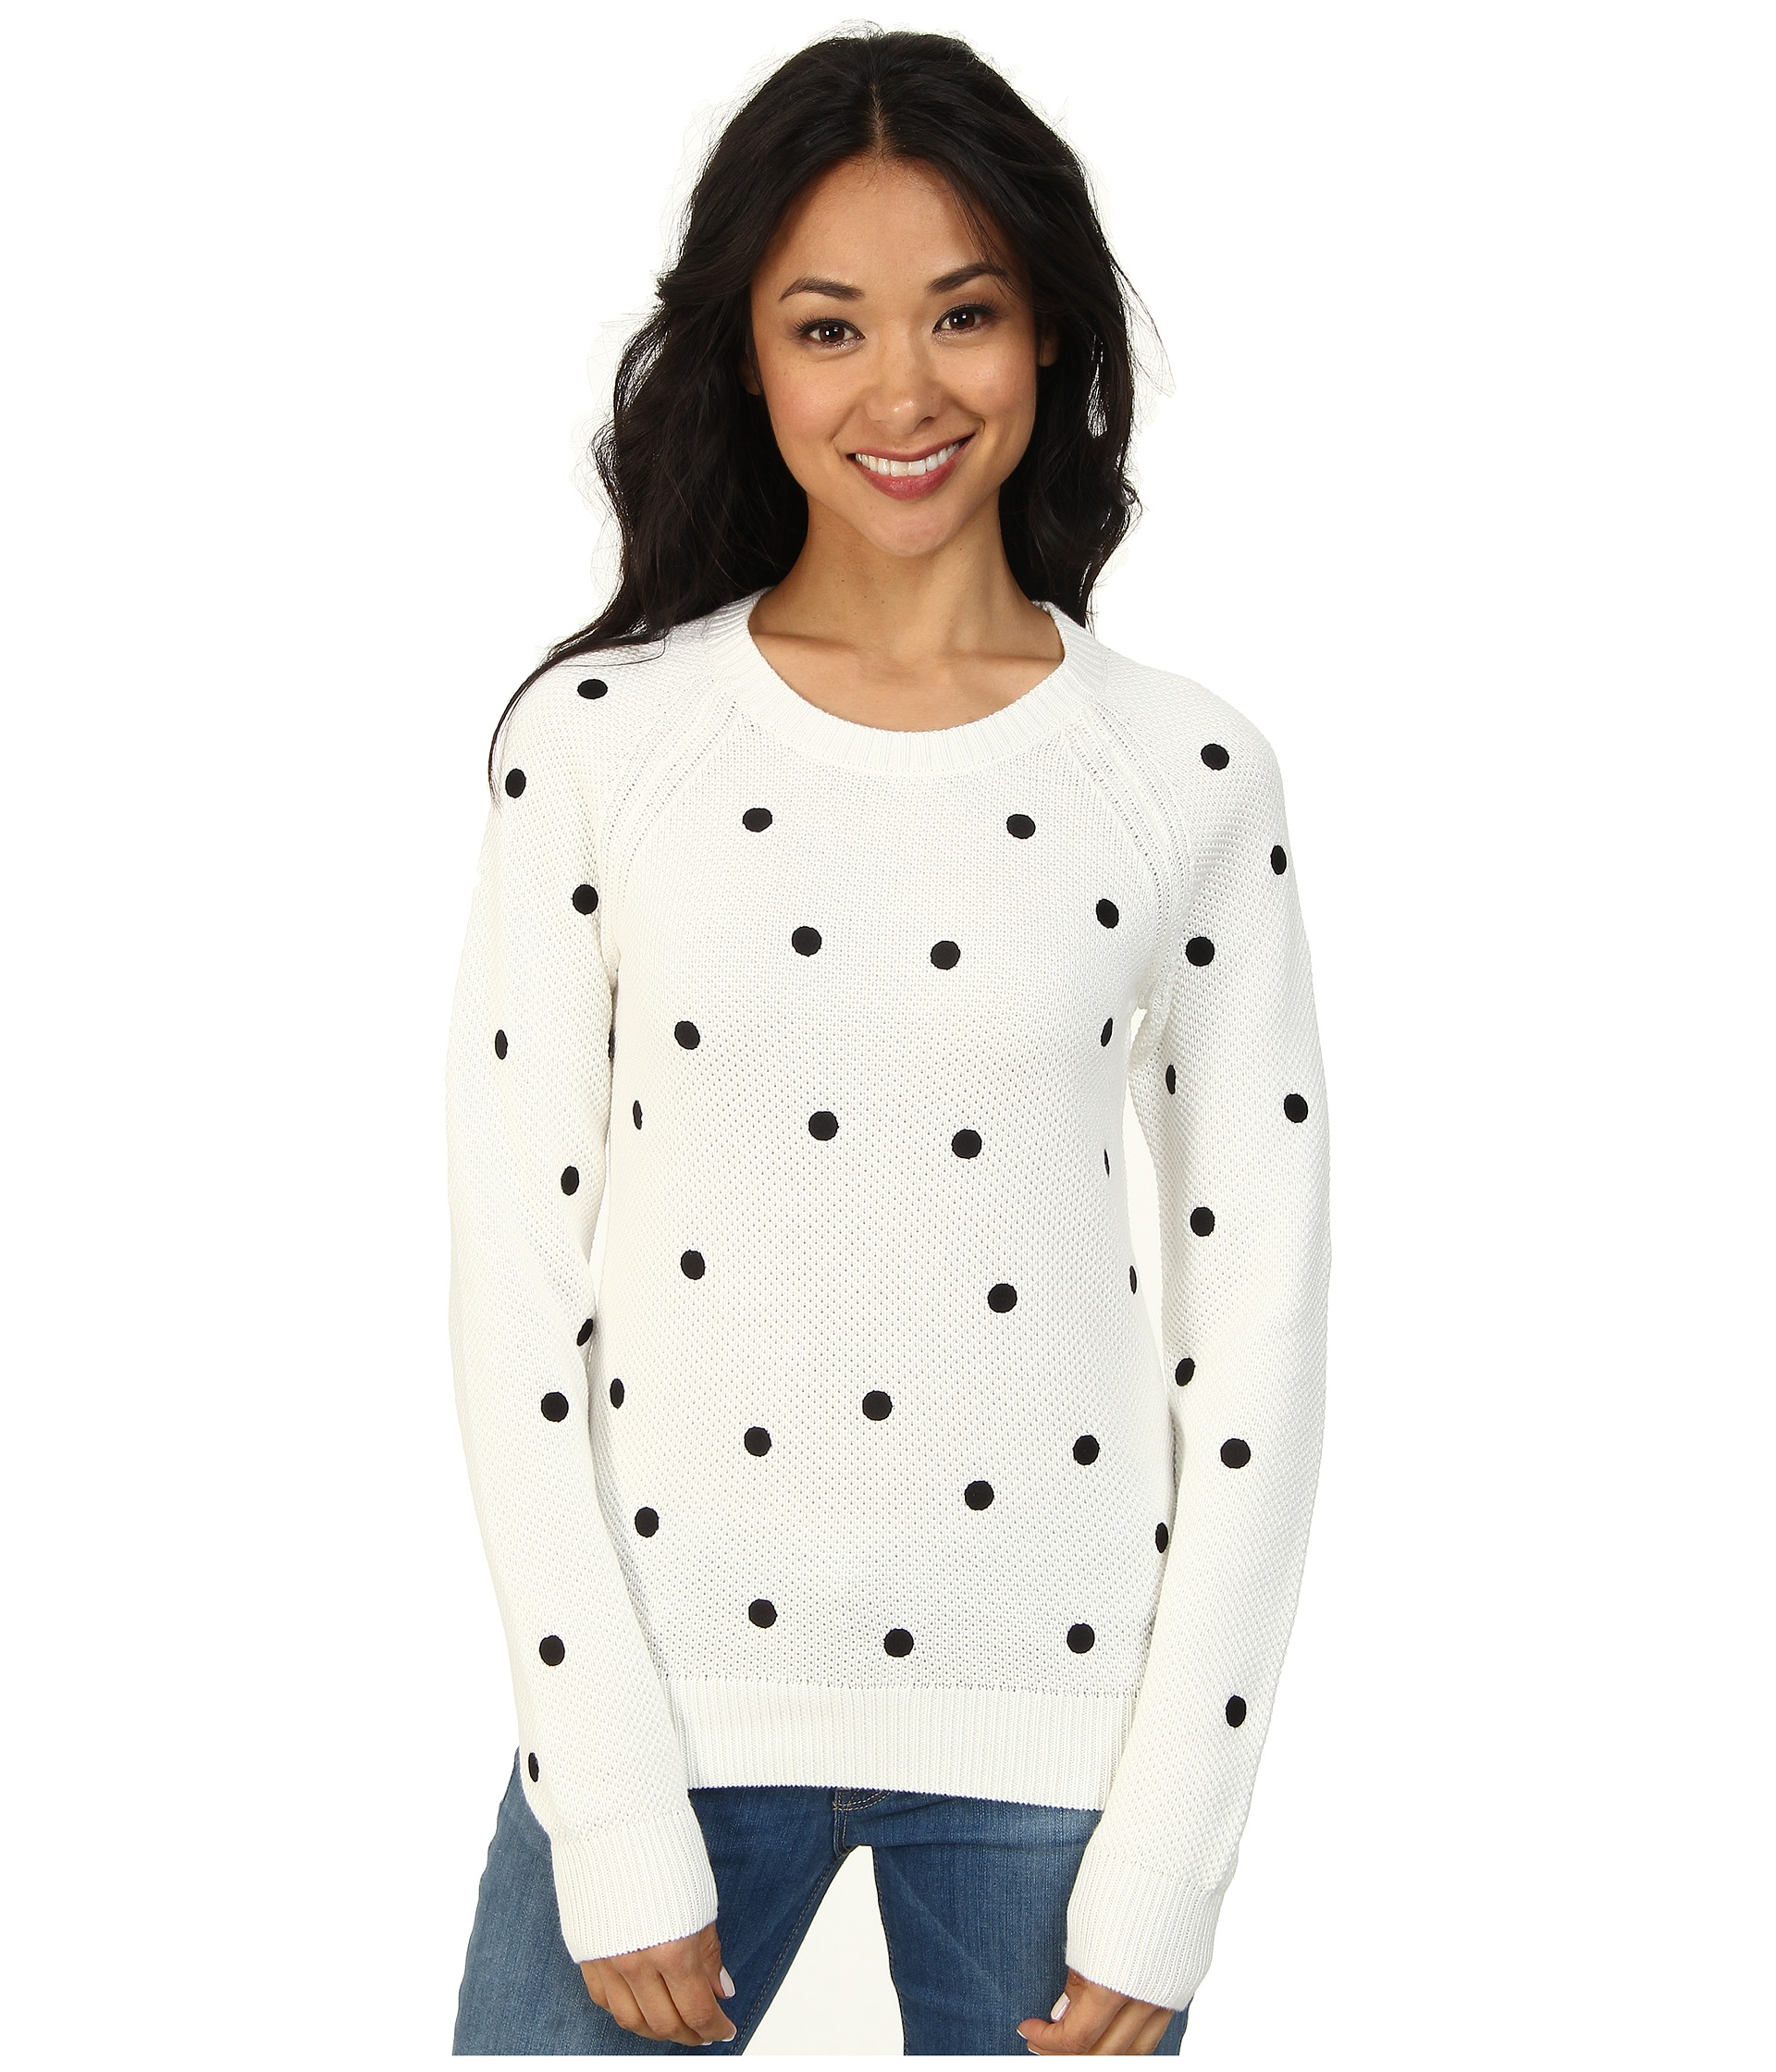 24f34ca21cb Lacoste L!Ve Long Sleeve Polka Dot Sweater in White - Lyst